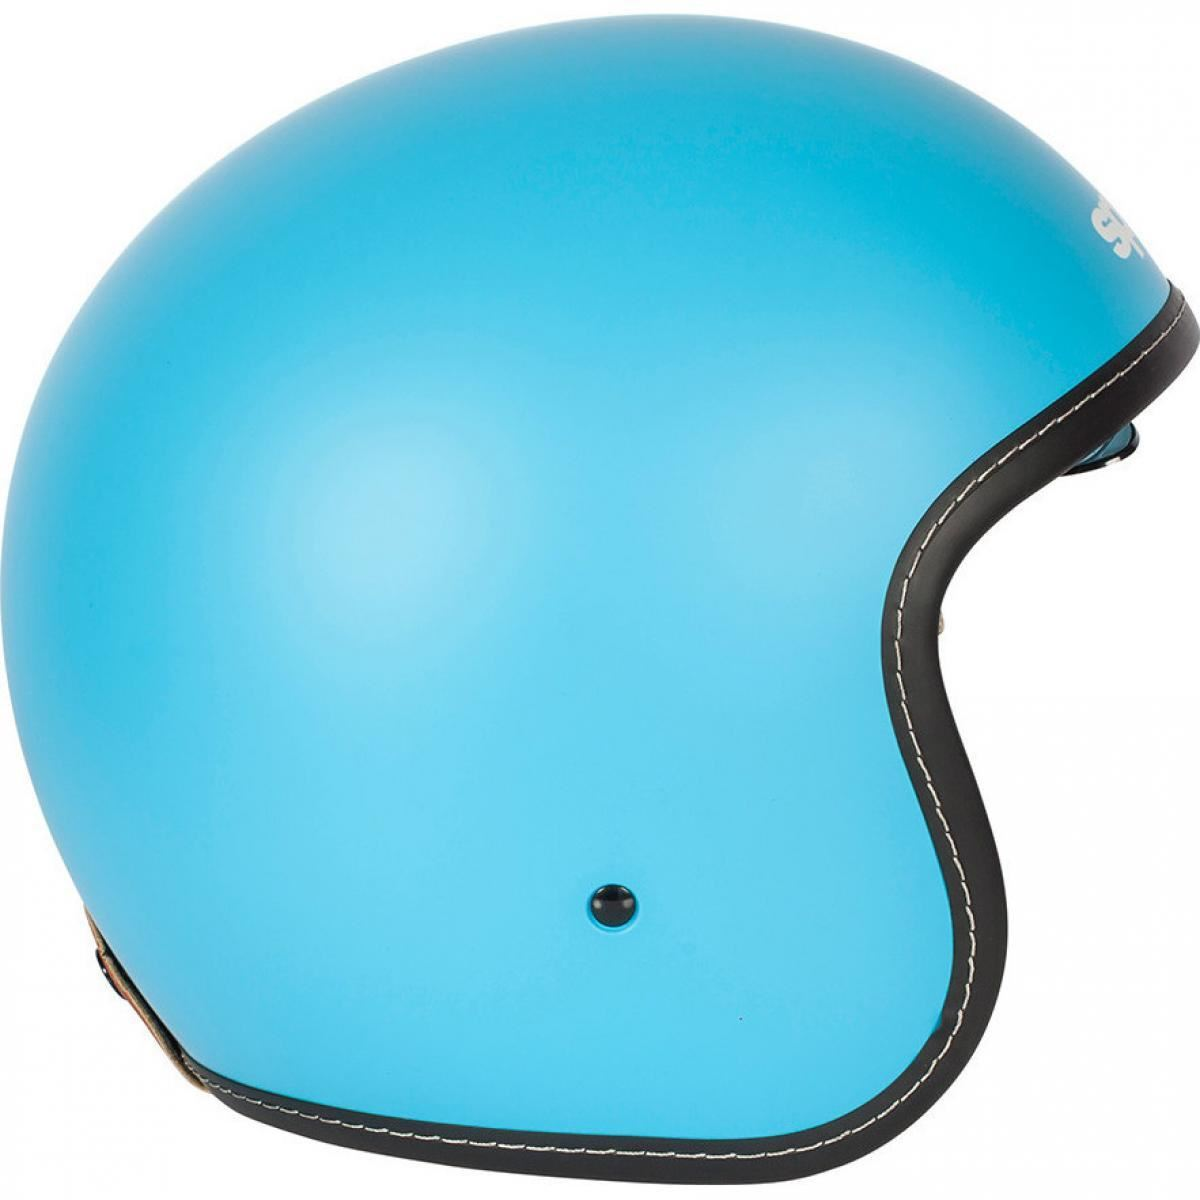 Spada-Raze-Ouvert-Casque-Bleu-Integre-Visiere miniature 15